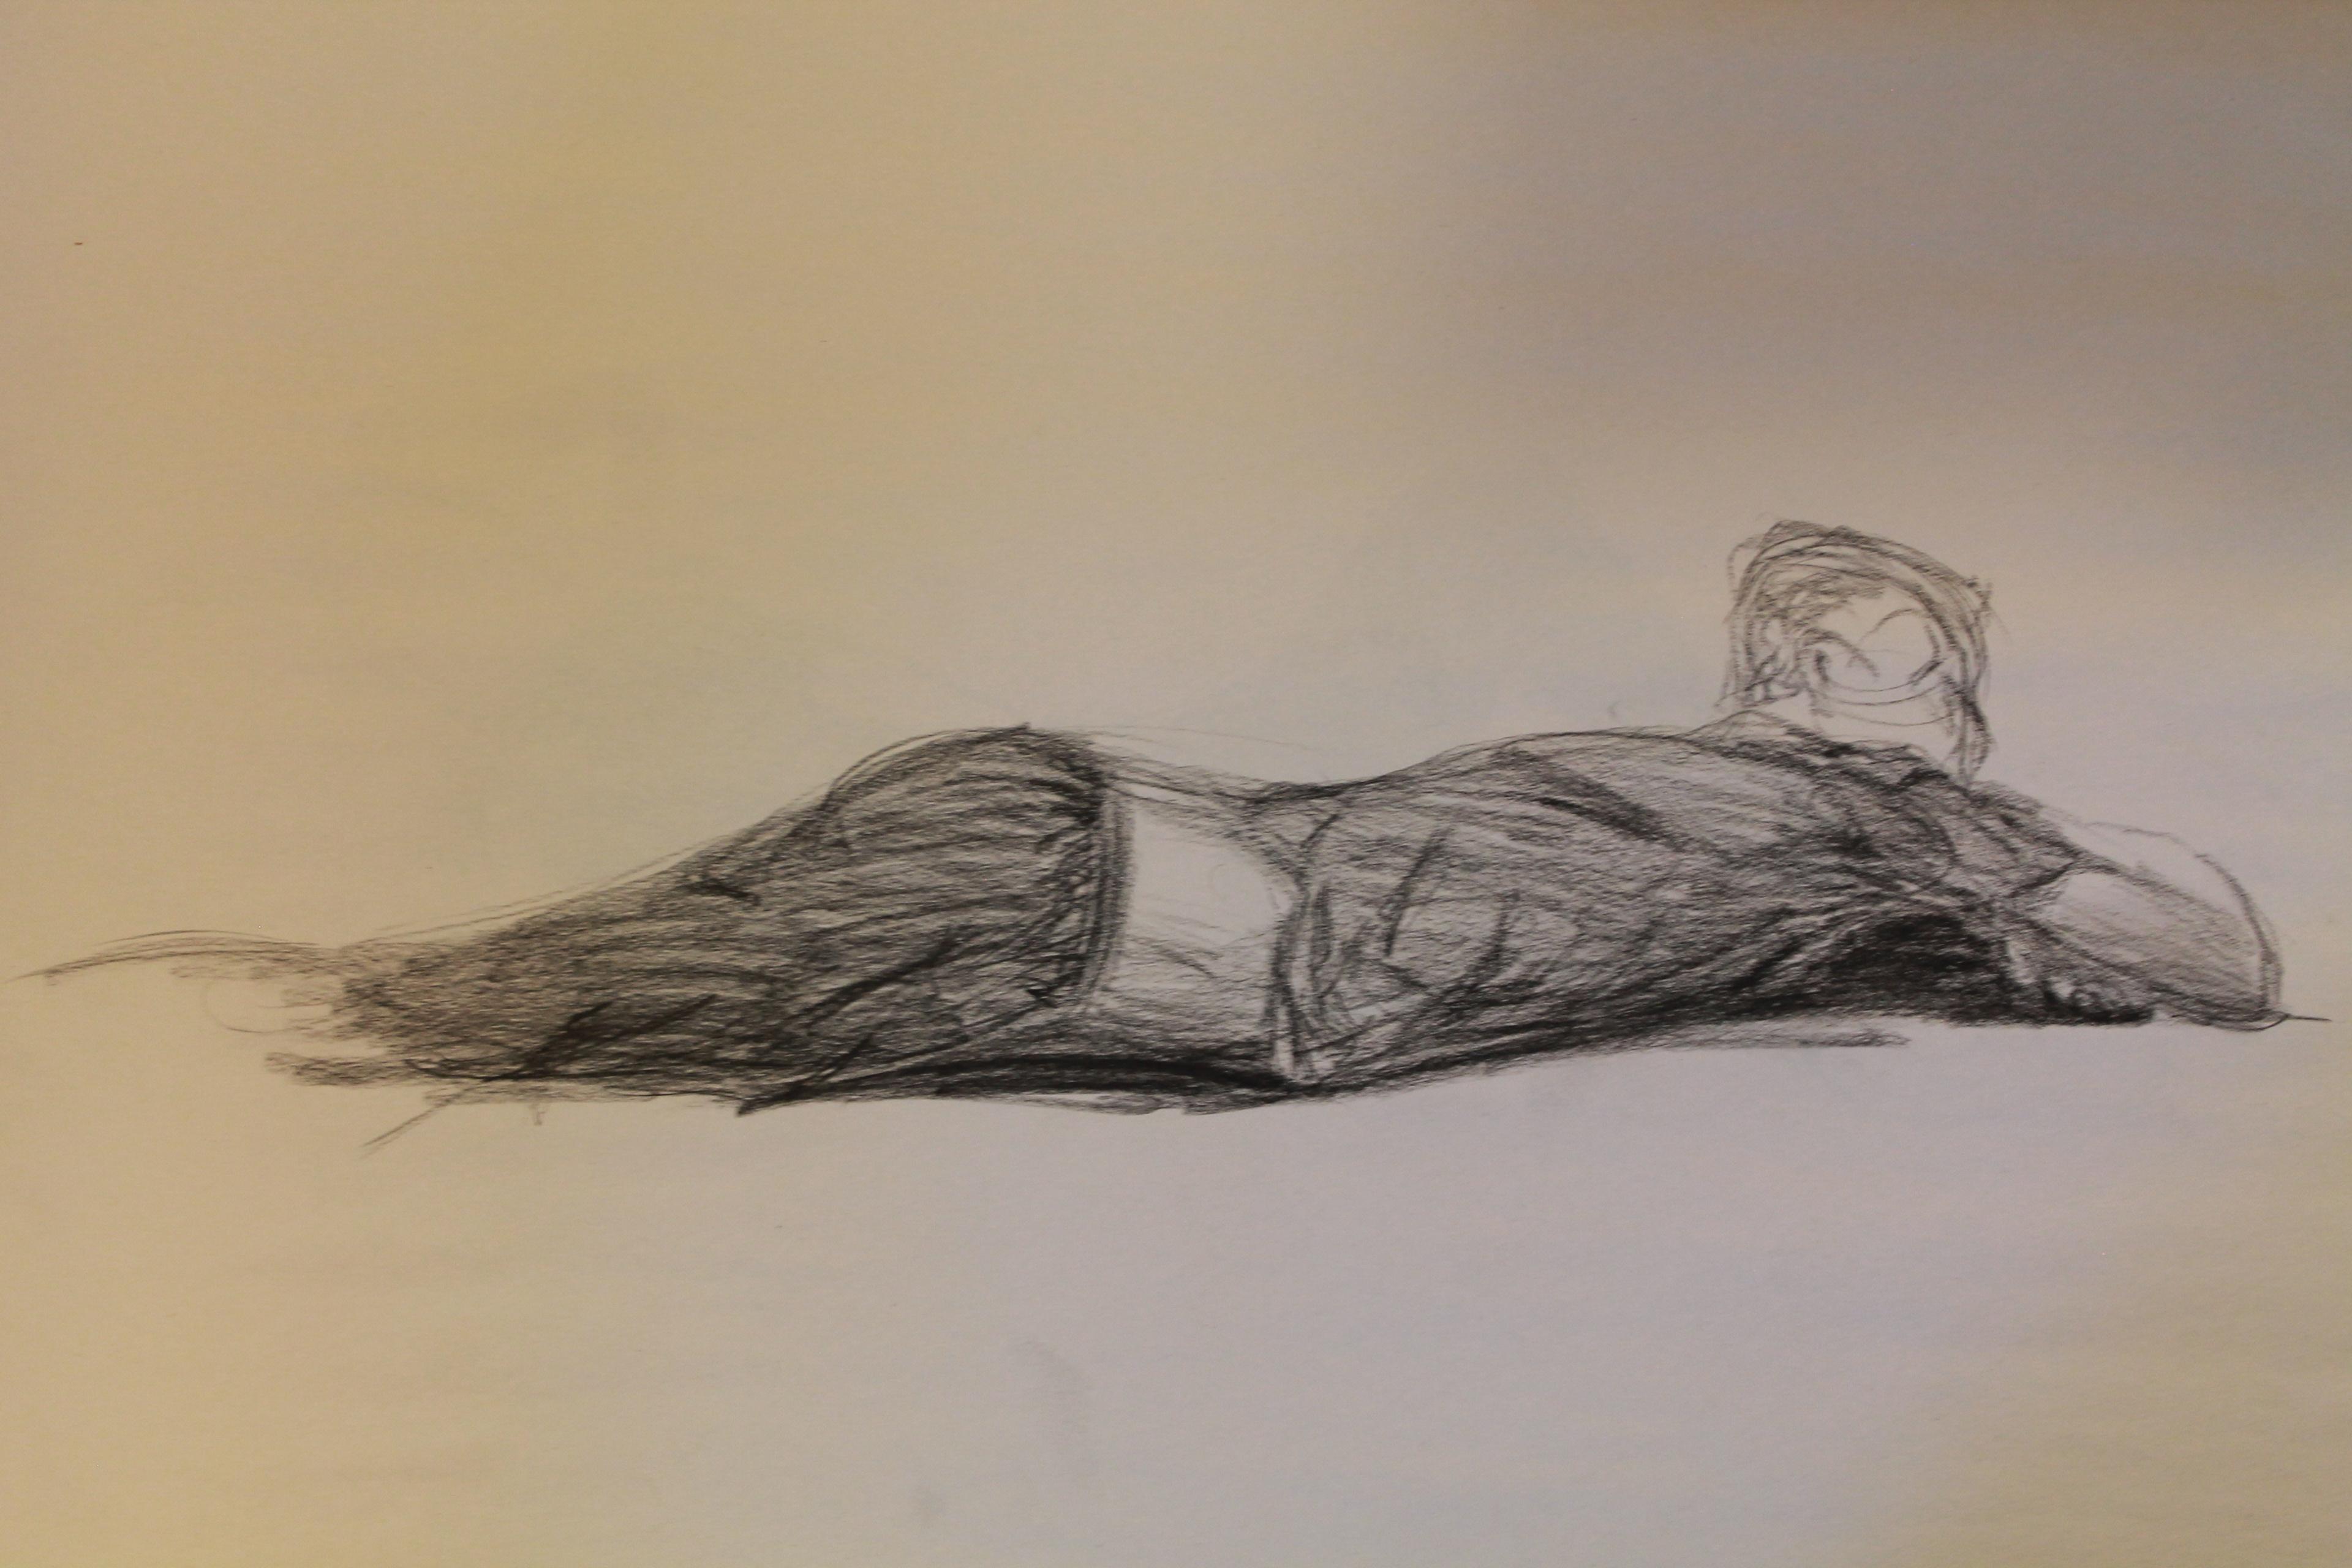 reagan burke 10 minute life drawing